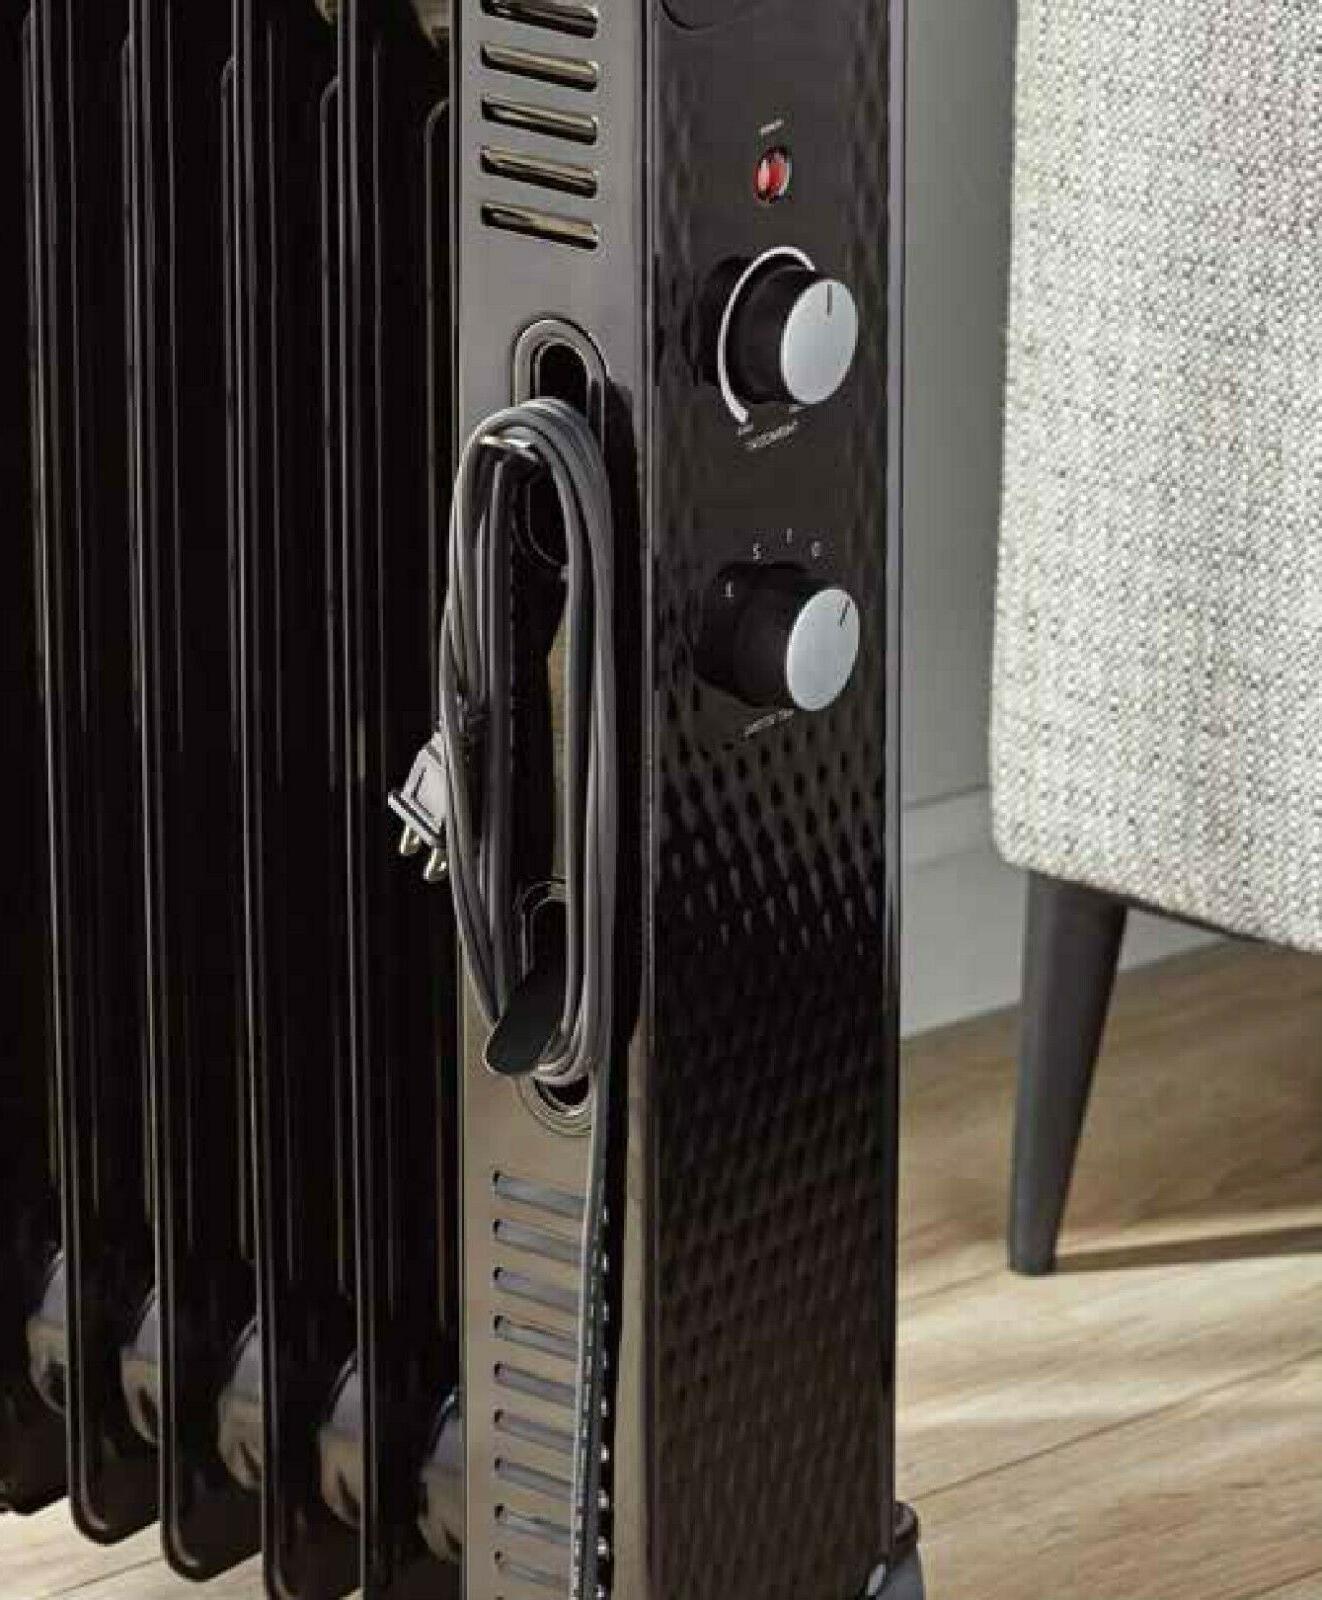 Electric Space Heater Oil Portable Floor Black